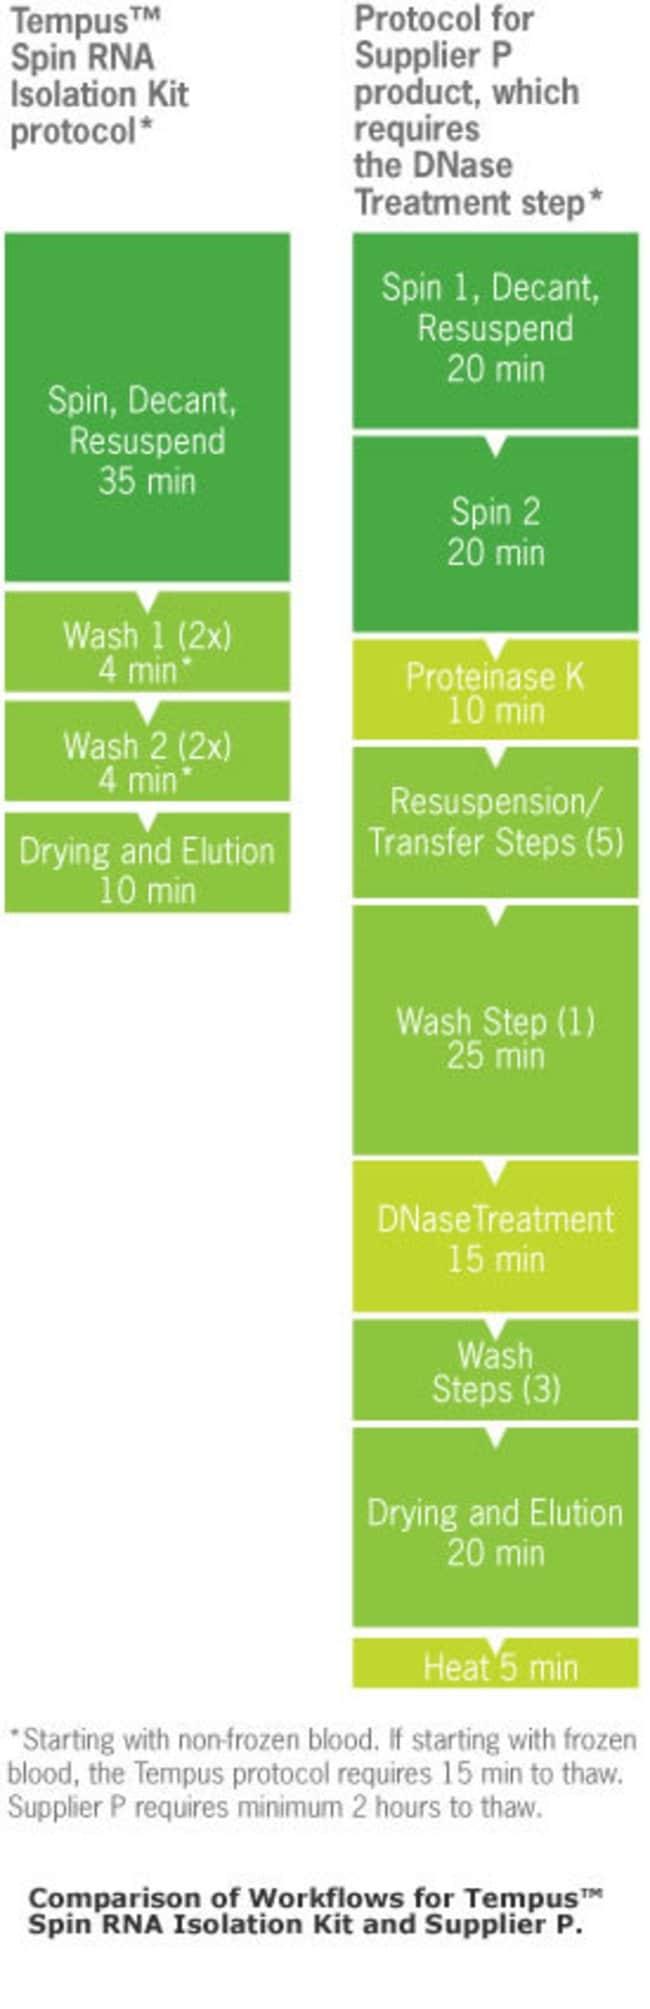 Figure 1: Comparison of Workflows